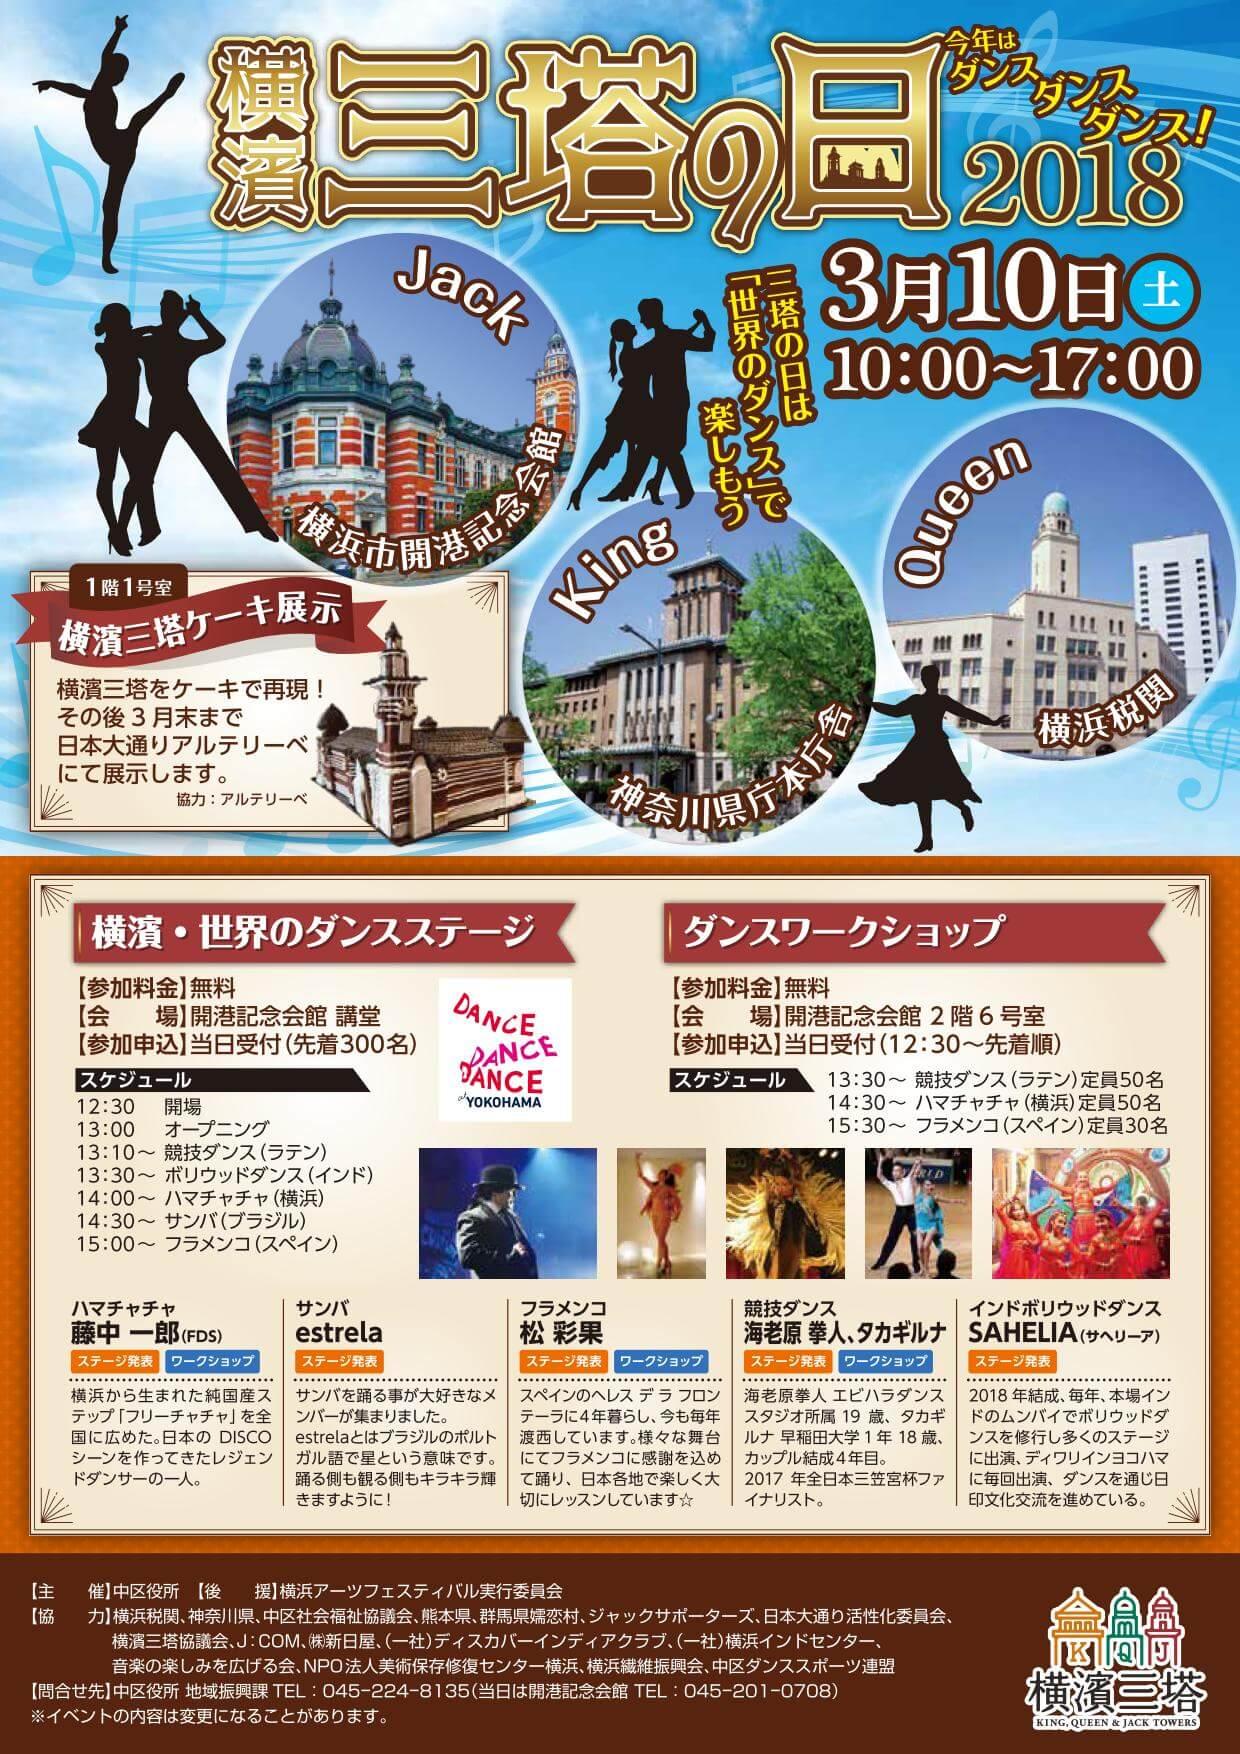 https://dance-yokohama.jp/wp-content/uploads/2018/02/yokohamasantou2018.pdf